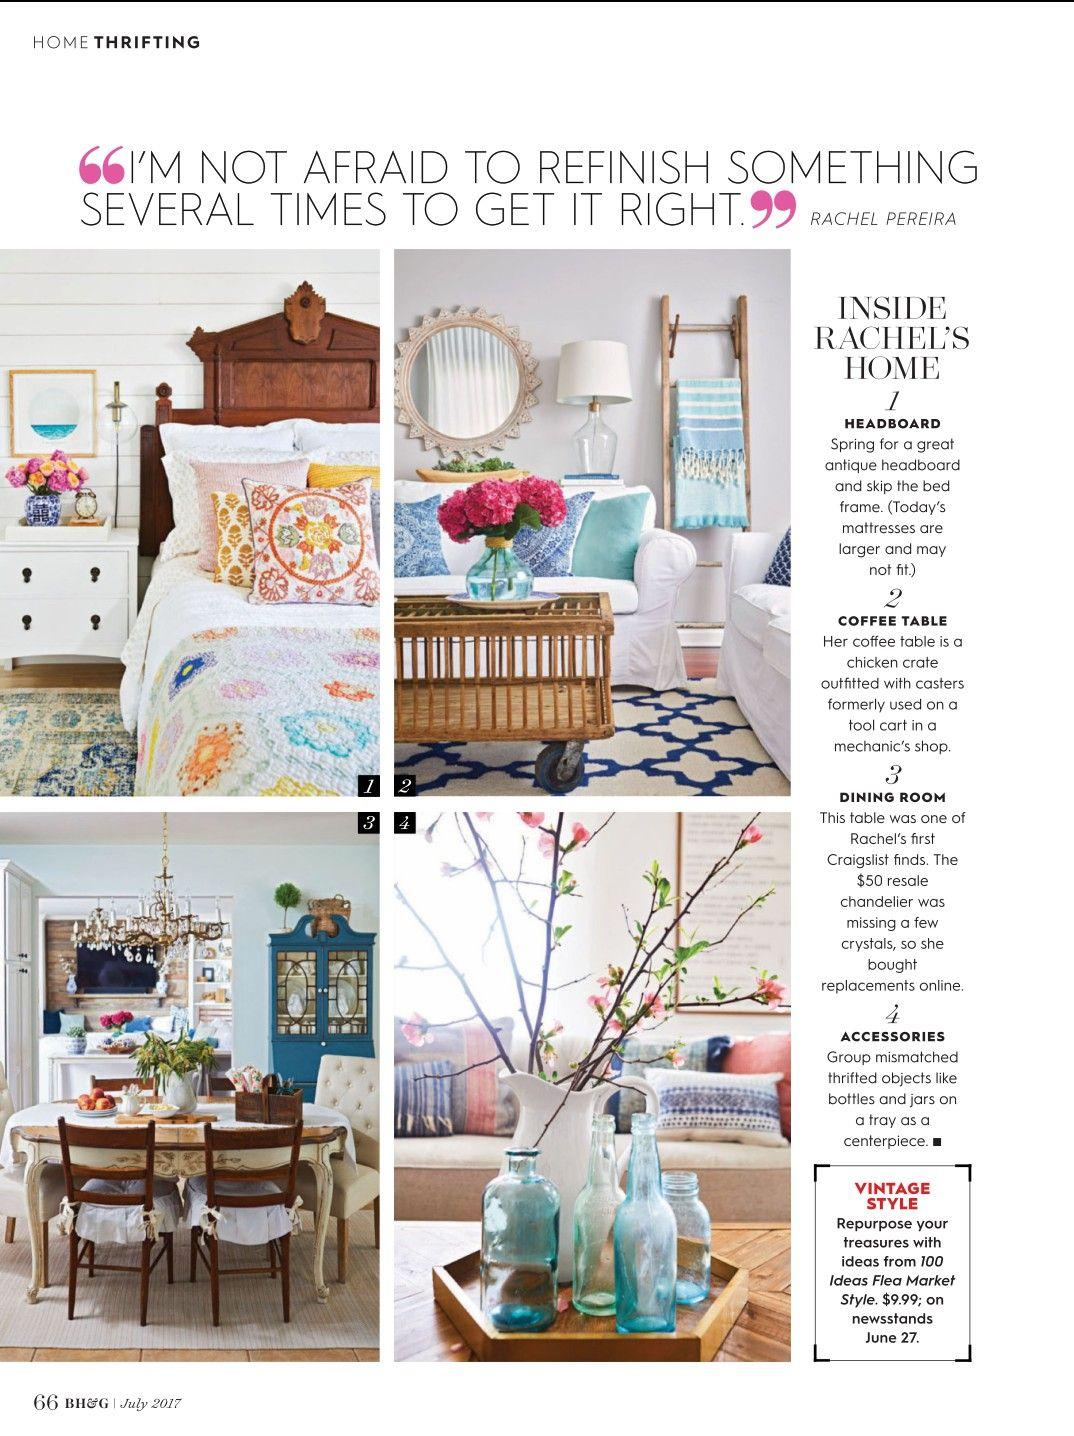 6446c756edc9a6efe42bc7045c7157f7 - Better Homes And Gardens Flea Market Style Magazine